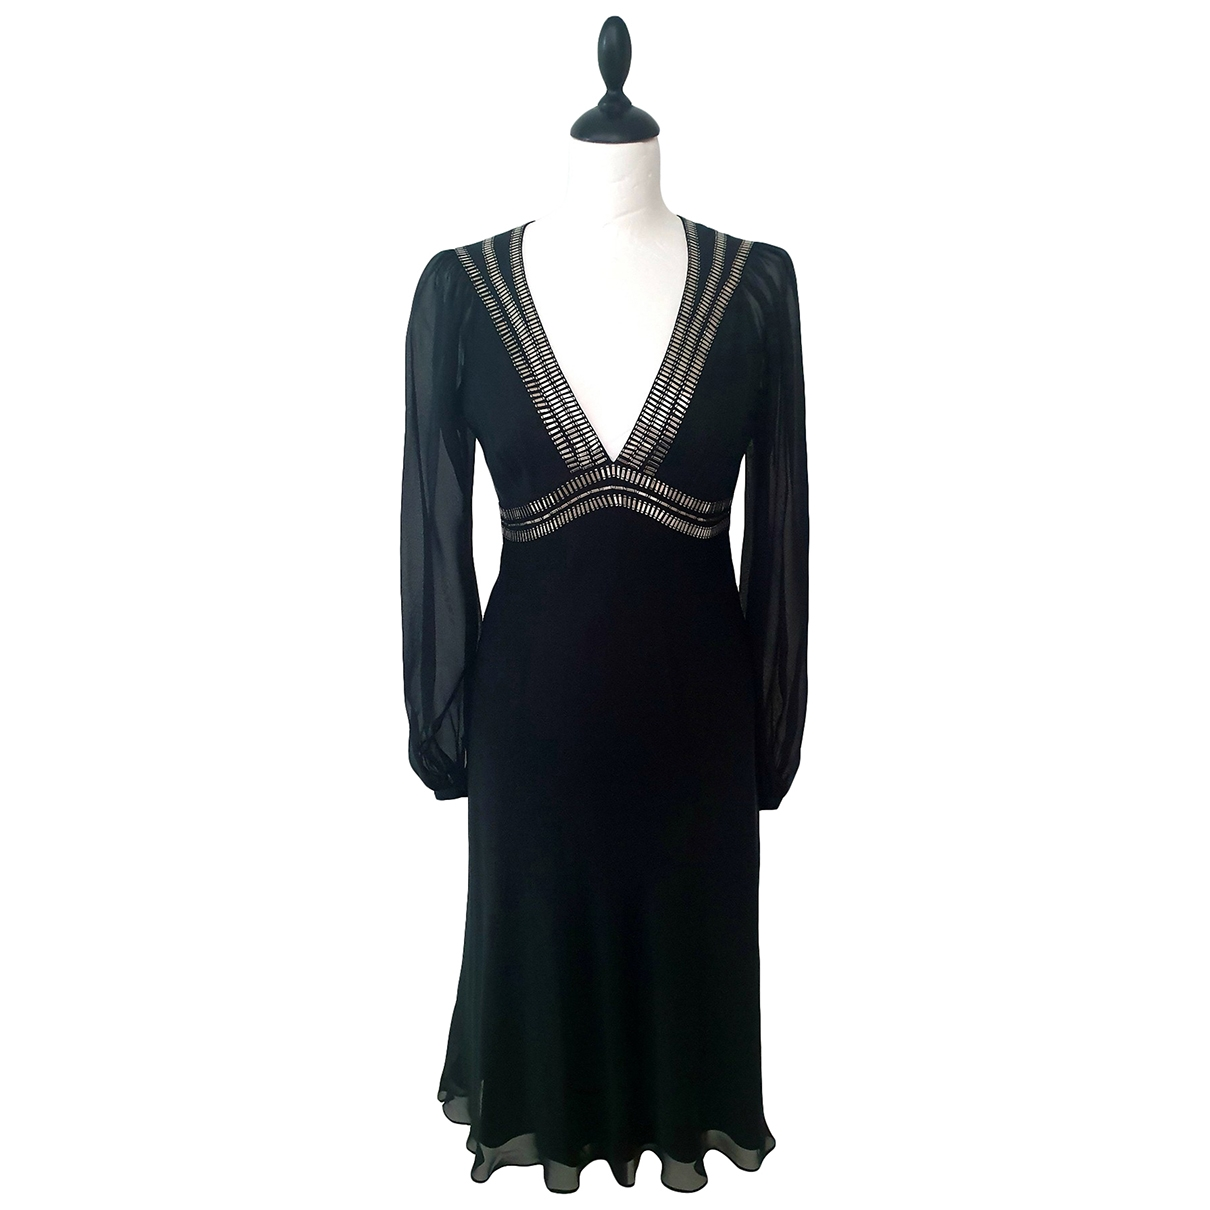 Temperley London \N Kleid in  Schwarz Seide